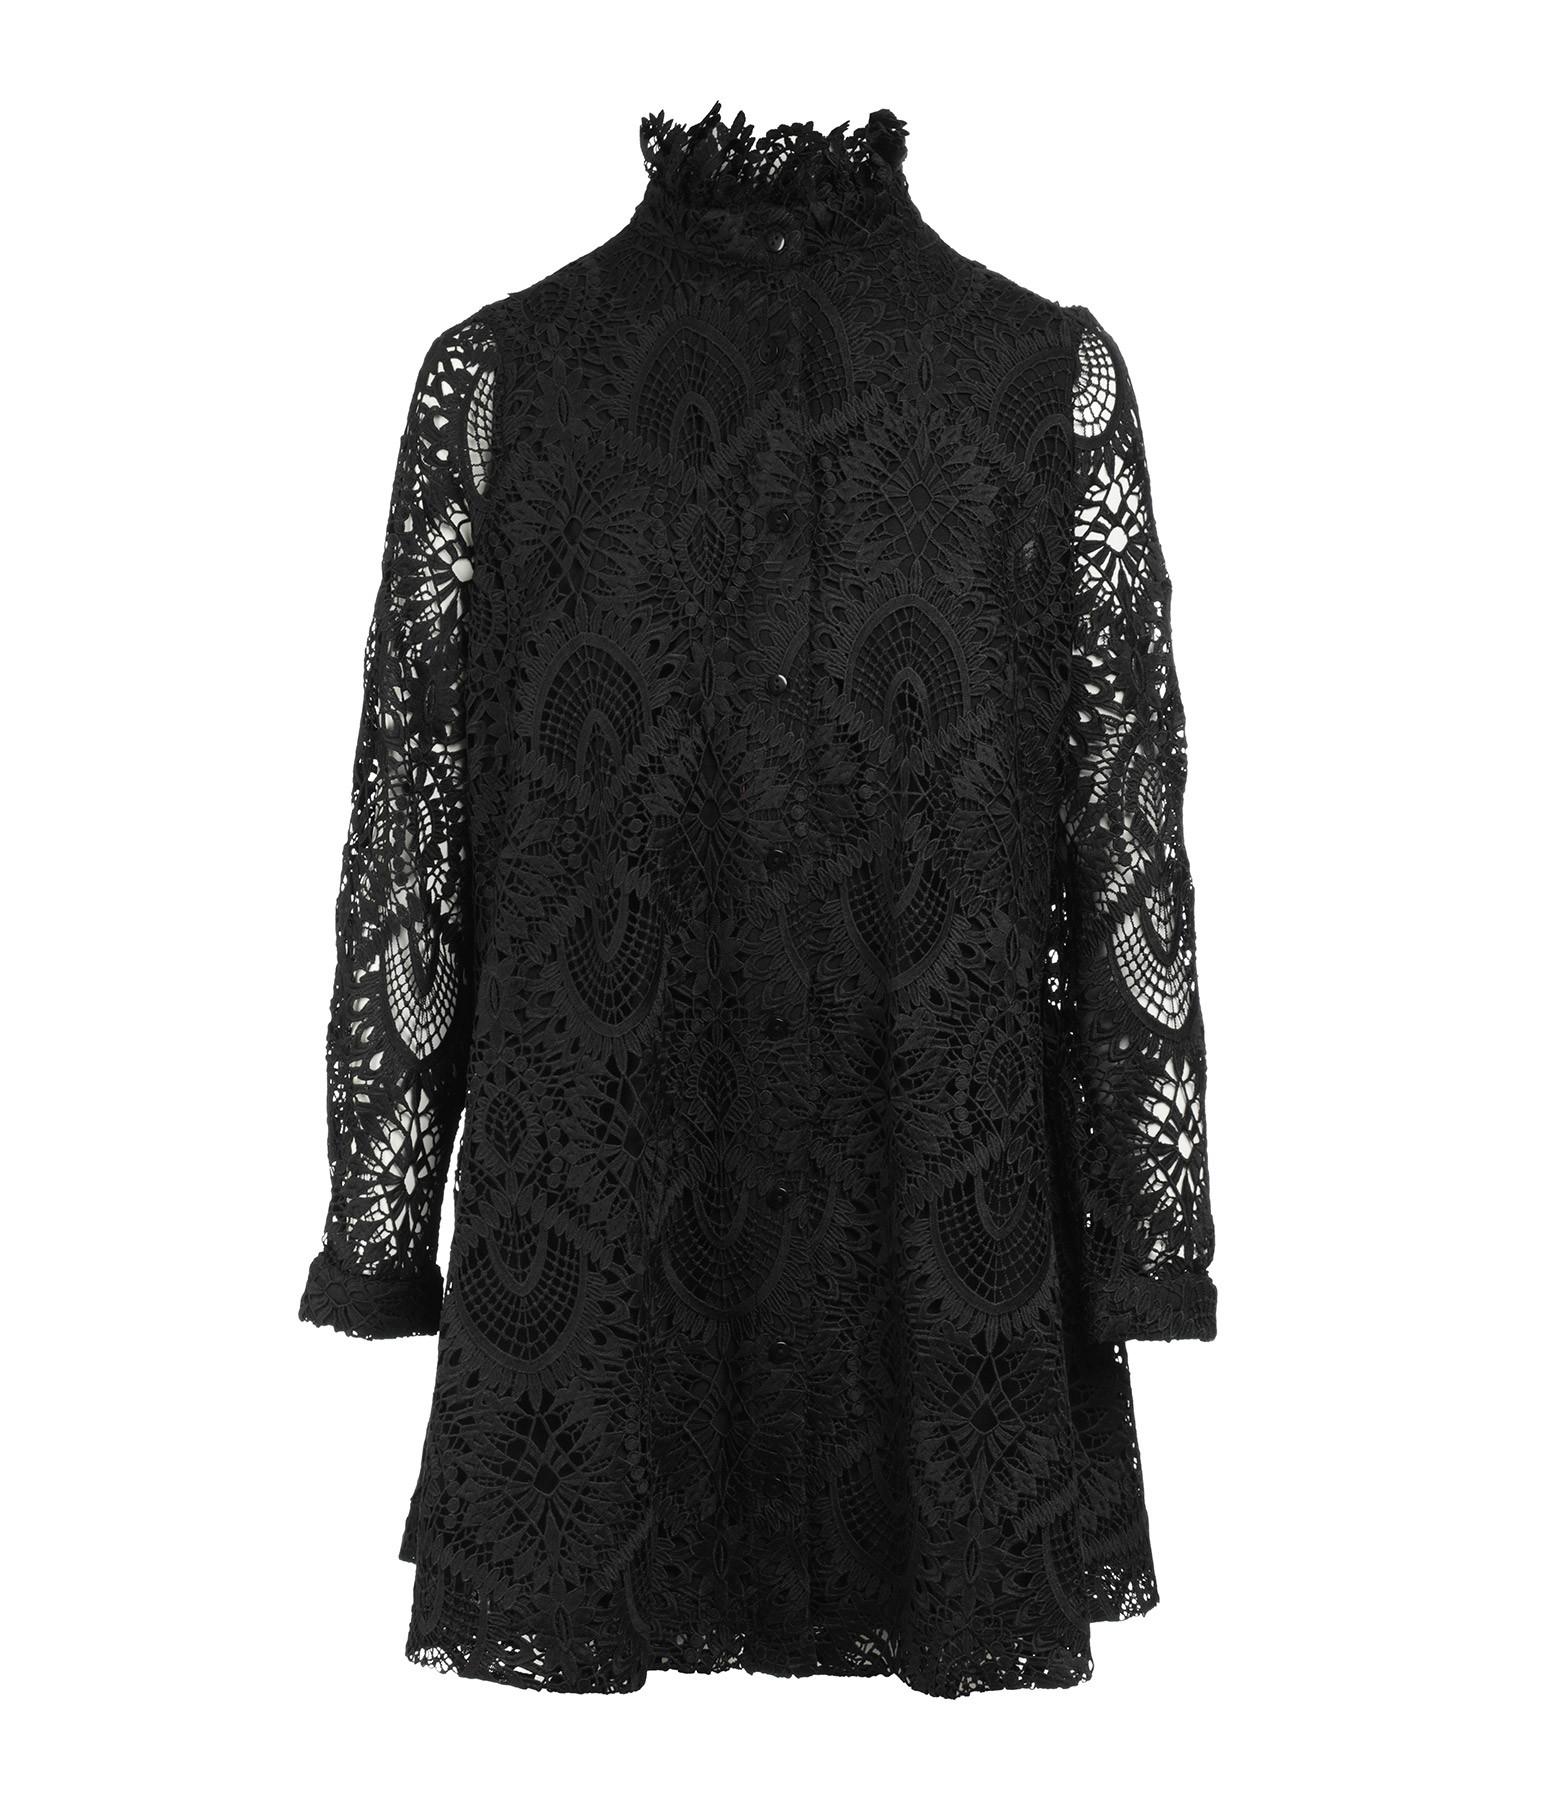 MODETROTTER - Robe Tao Imprimé Tolki Noir